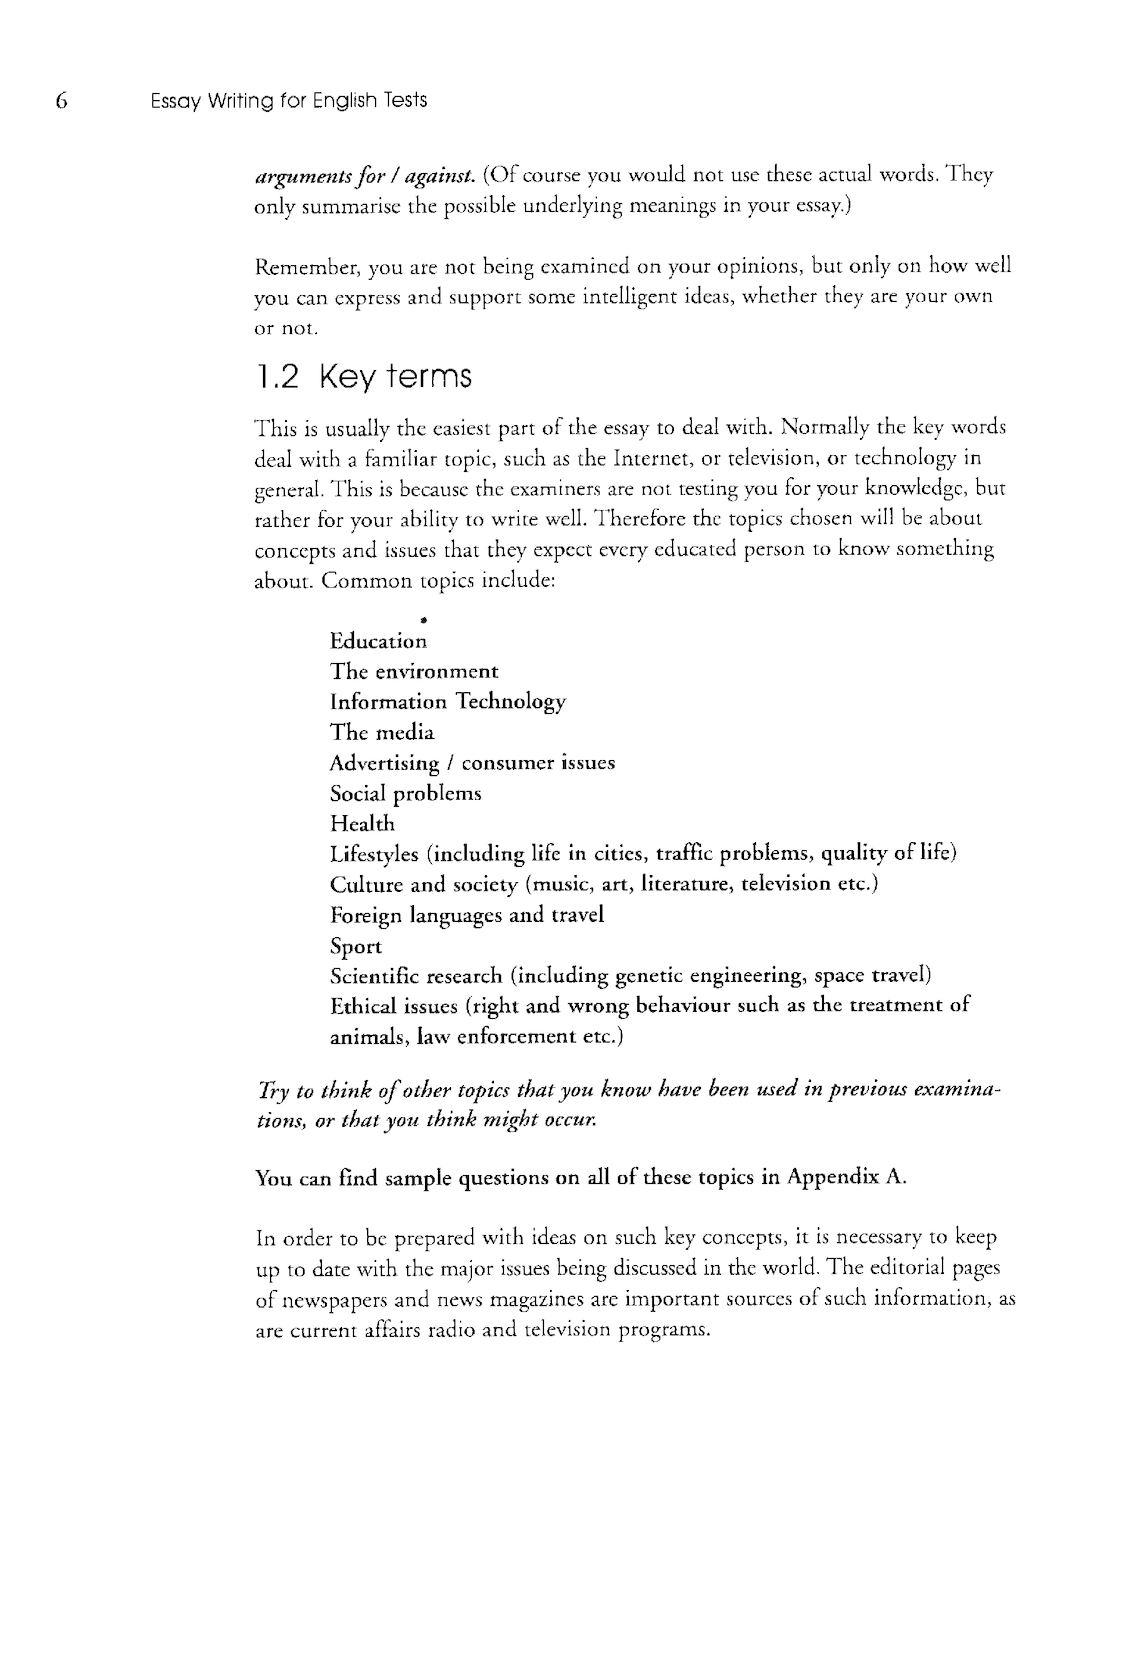 essay writing gabi duigu Writing essoy for tests english gobi duigu @ gabi duigu 2002 all rightsreserved revised and reprinted2003 published academicenglishpress by 9/13 armstrongstreet ns\f 2062 cammeray australia p h : 0 2 9 4 3 76 3 3 0 eduau email: gduigu@unsw.